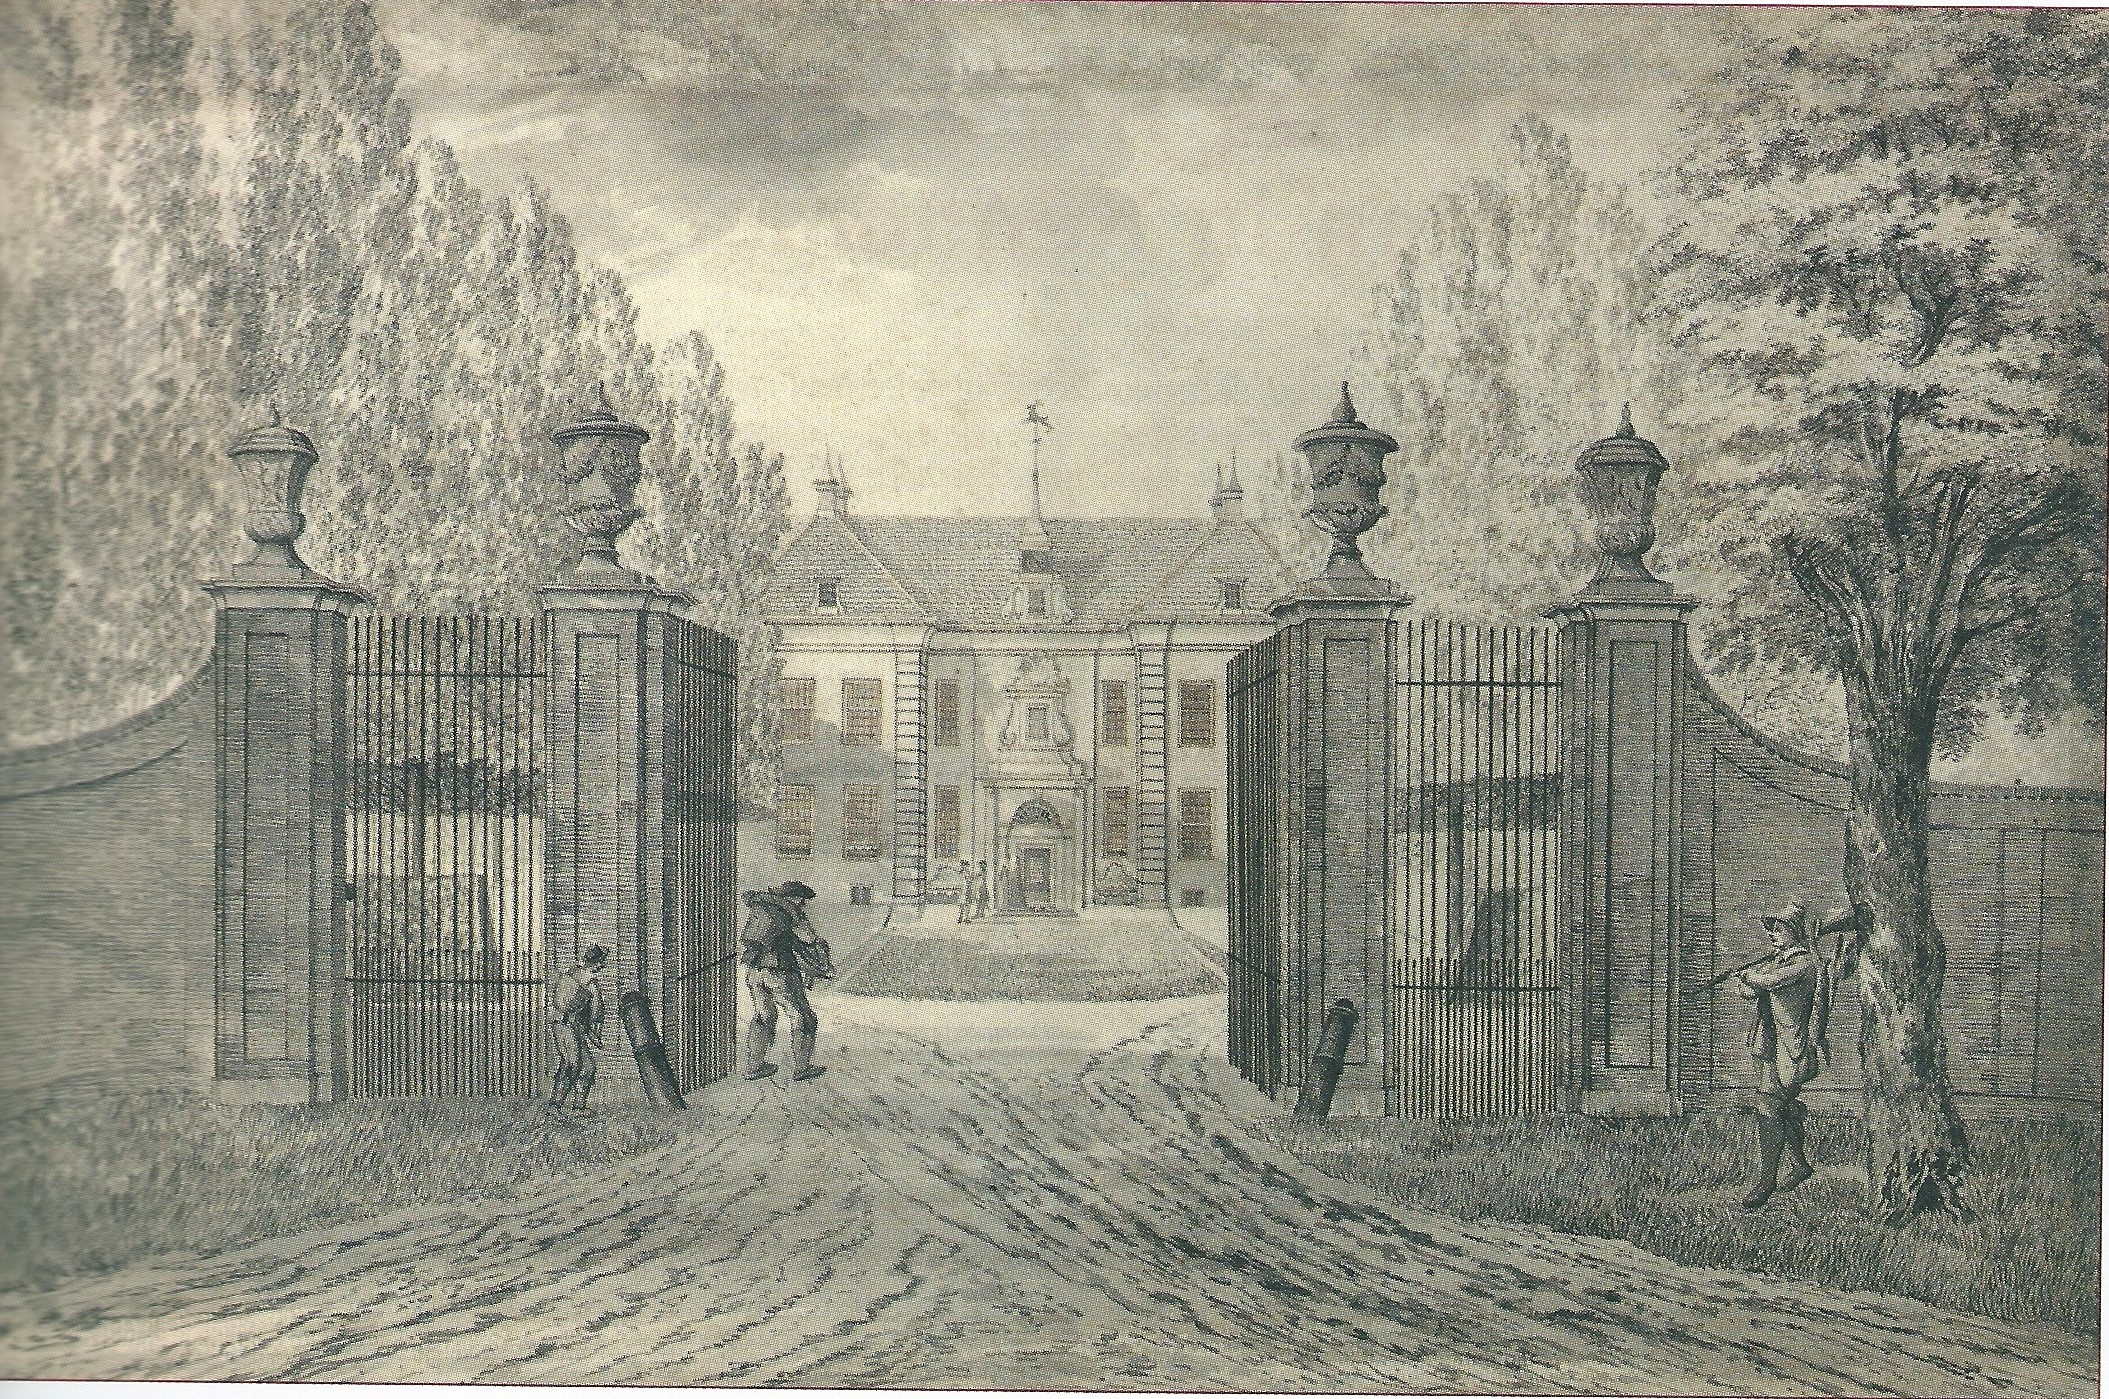 Historie van Eikenrode (Overplaats de Hartekamp) /architecten J.A.G ...: https://ilibrariana.wordpress.com/2012/02/08/historie-eikenrode...